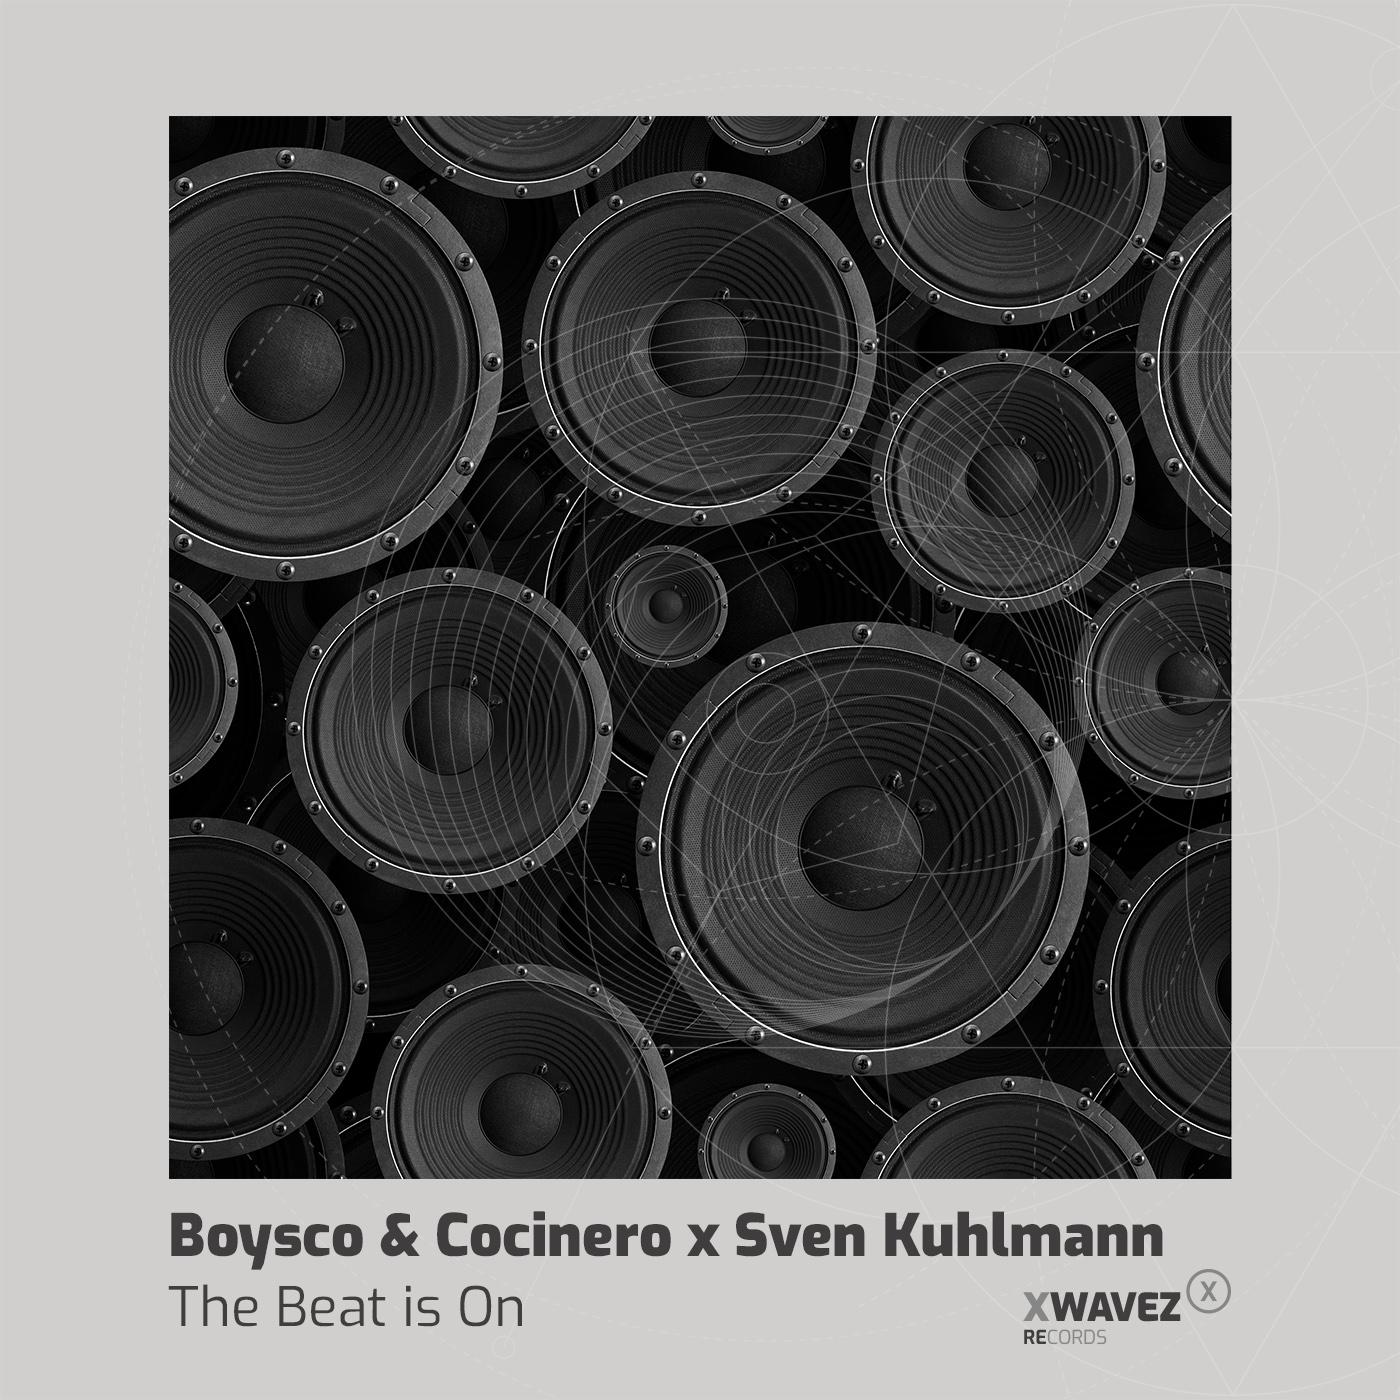 Boysco & Cocinero x Sven Kuhlmann - The Beat Is On